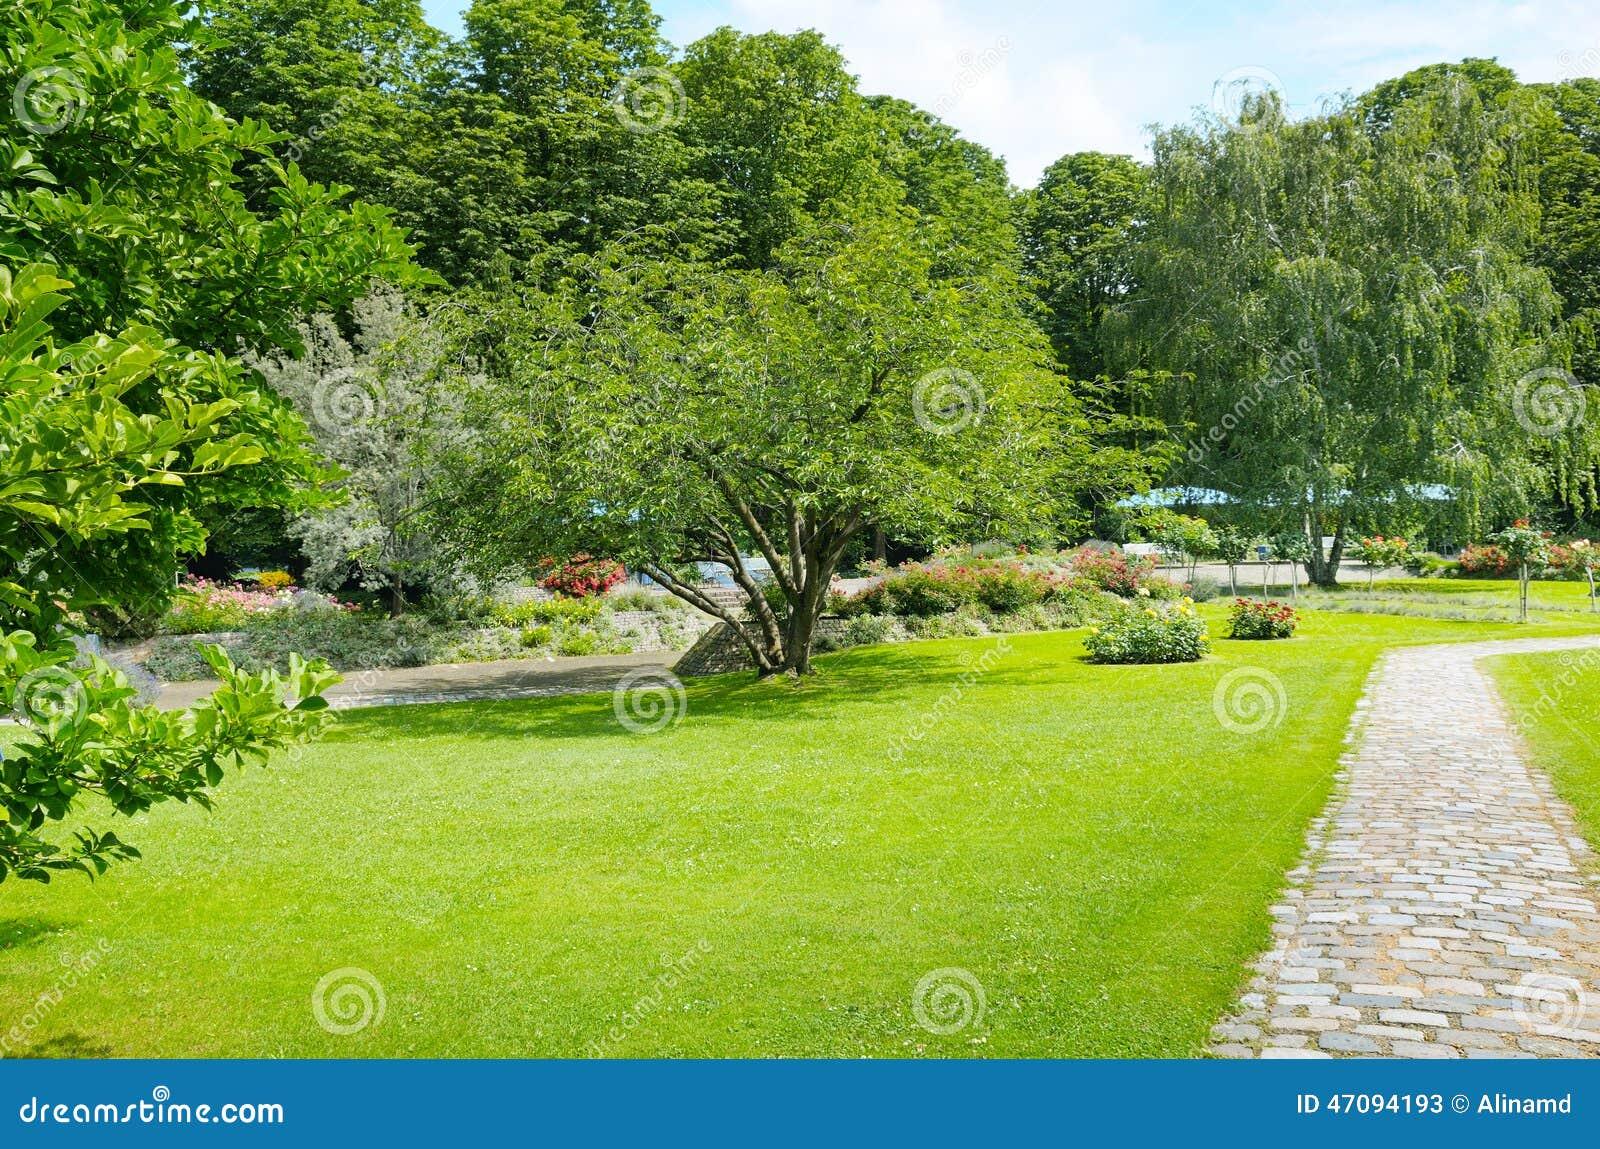 bossies, 颜色, 五颜六色, 域, 华腴, 花卉, 花, 花圃, 正式, 庭院图片